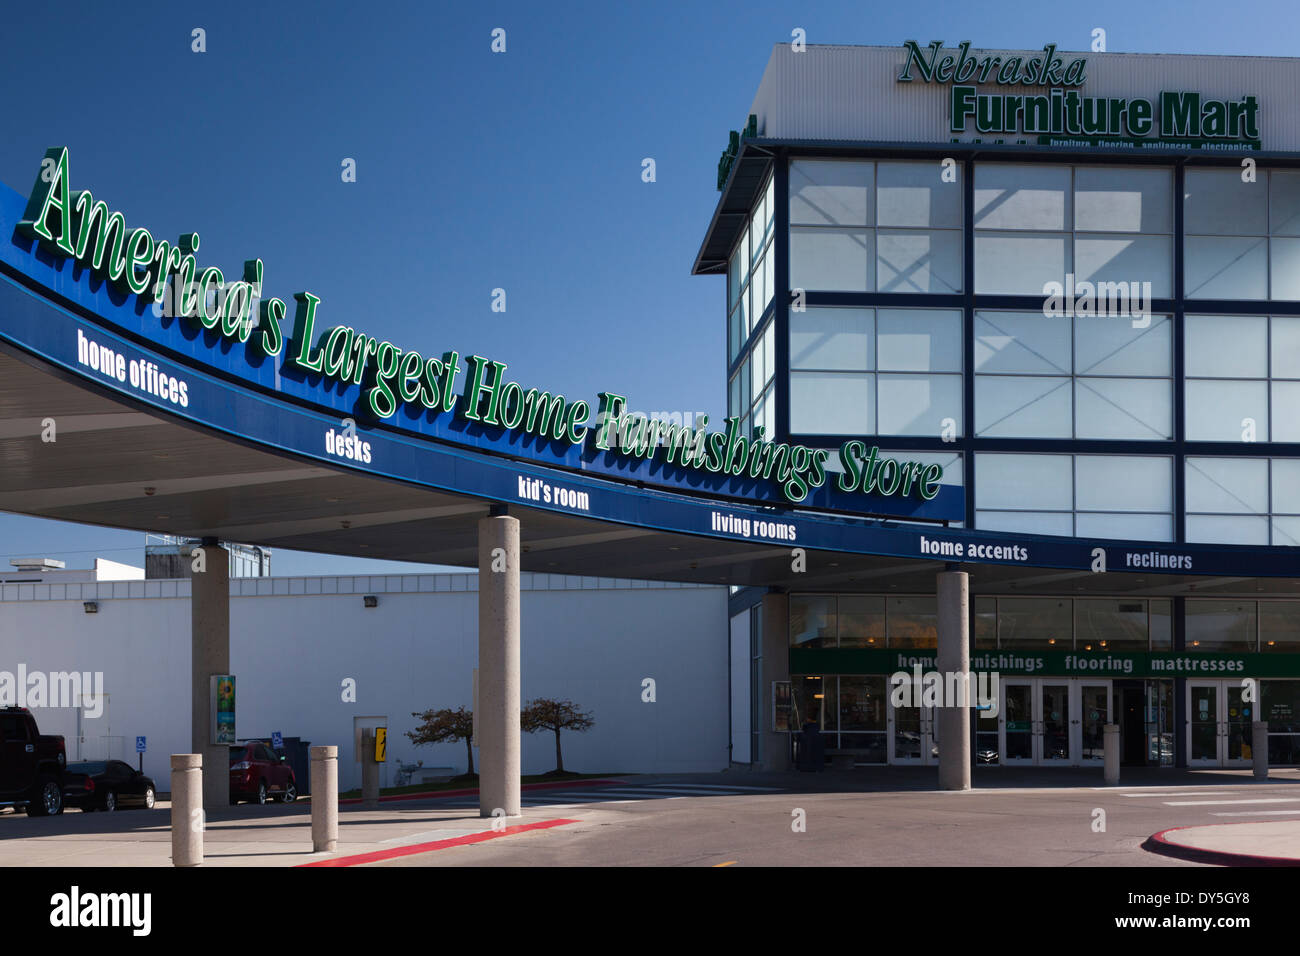 USA, Nebraska, Omaha, Nebraska Furniture Mart, Largest Furniture Store In  The USA